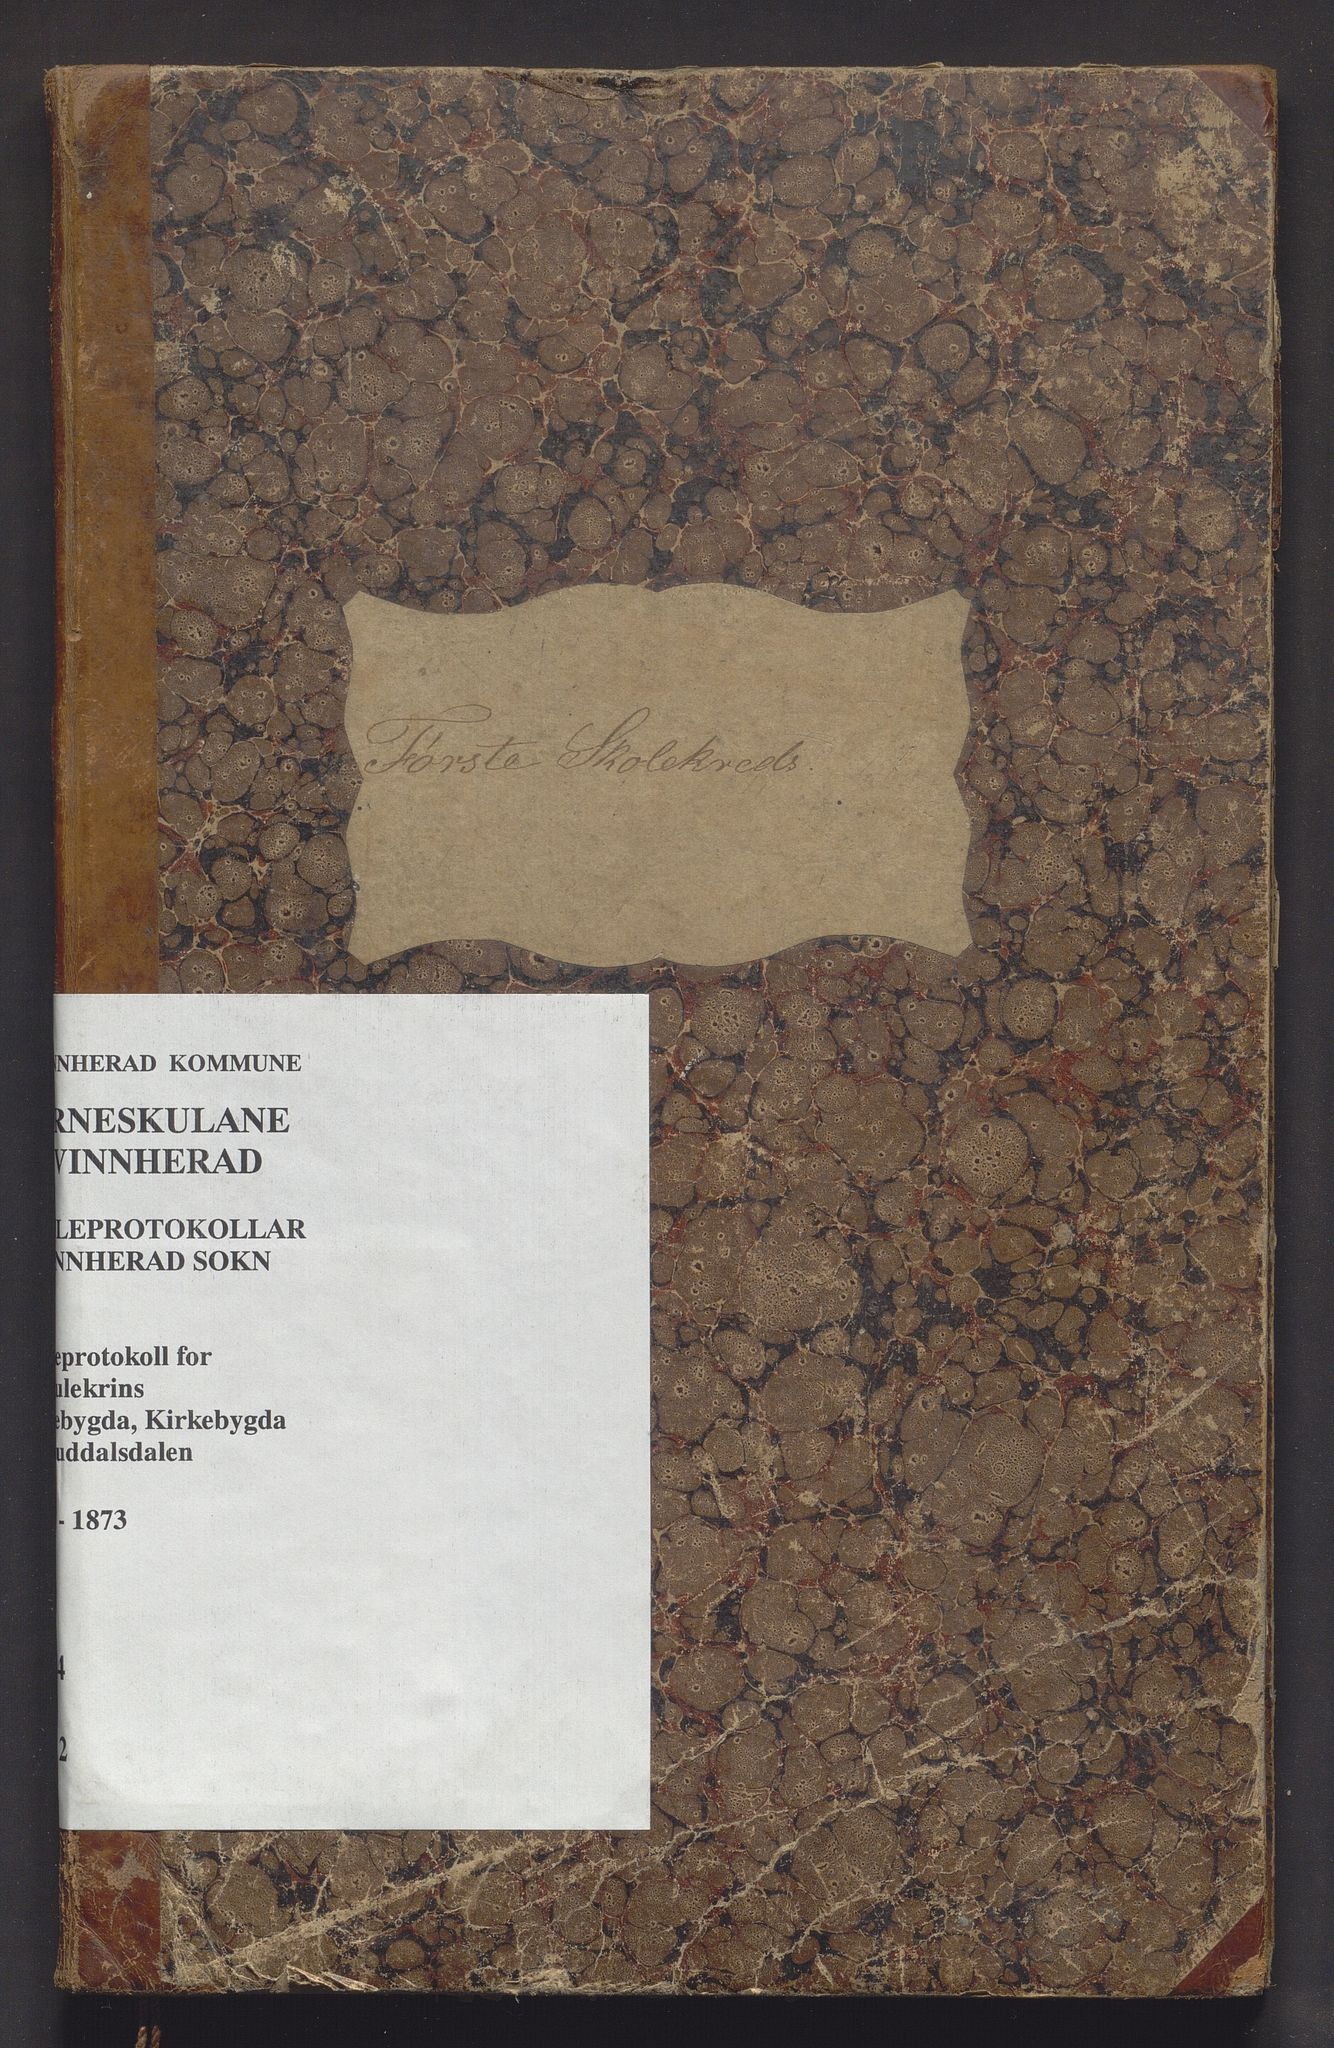 IKAH, Kvinnherad kommune. Barneskulane, F/Fe/L0002: Skuleprotokoll for 1. skulekrins: Skaalebygden, Kirkebygden og Guddalsdalen krinsskular , 1862-1873